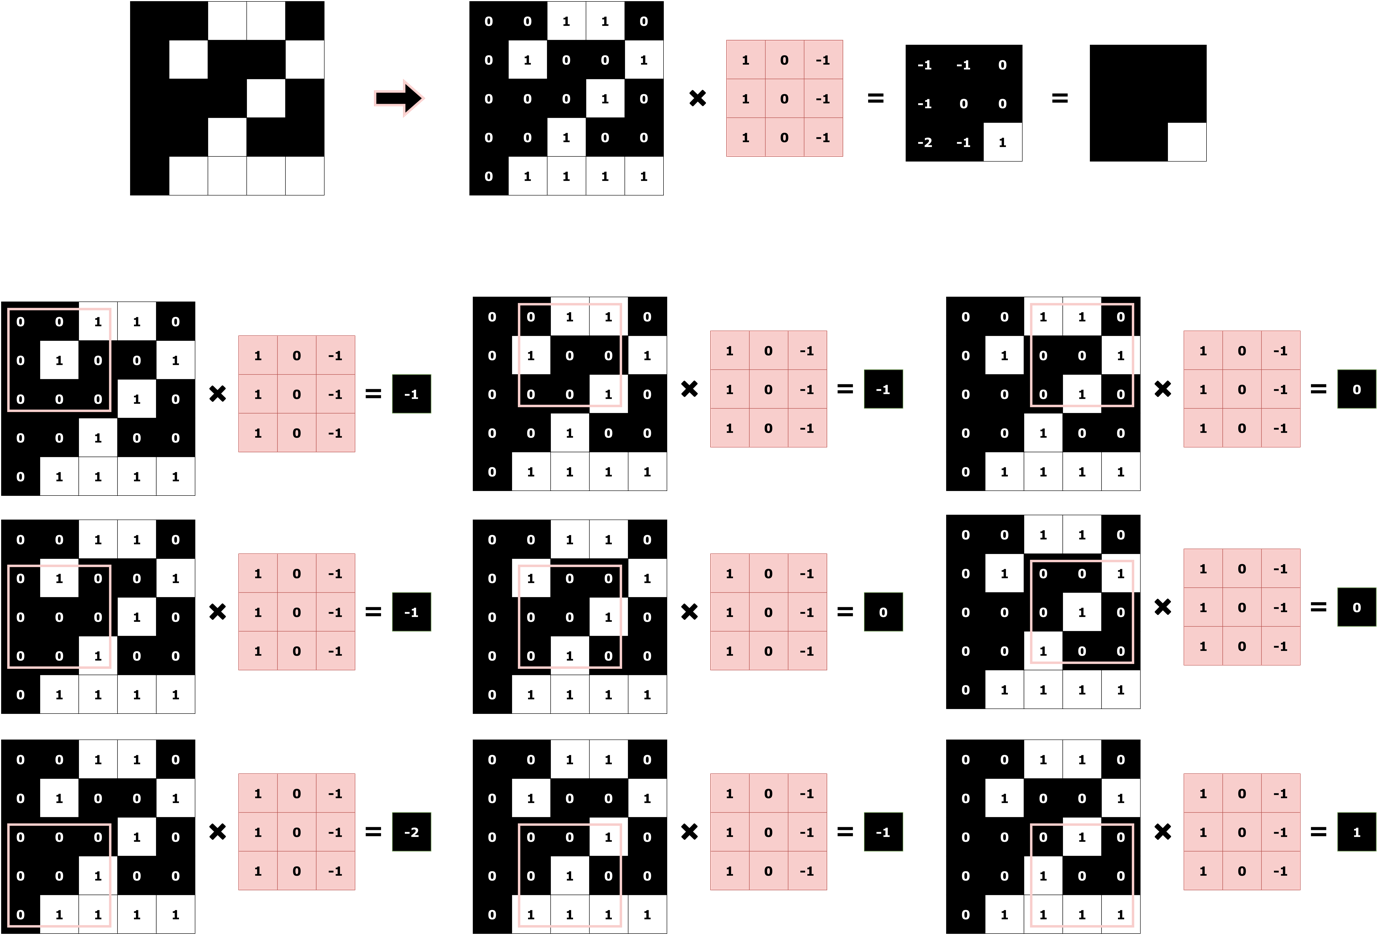 Figure 5. Convolutional Operation on Digit '2'